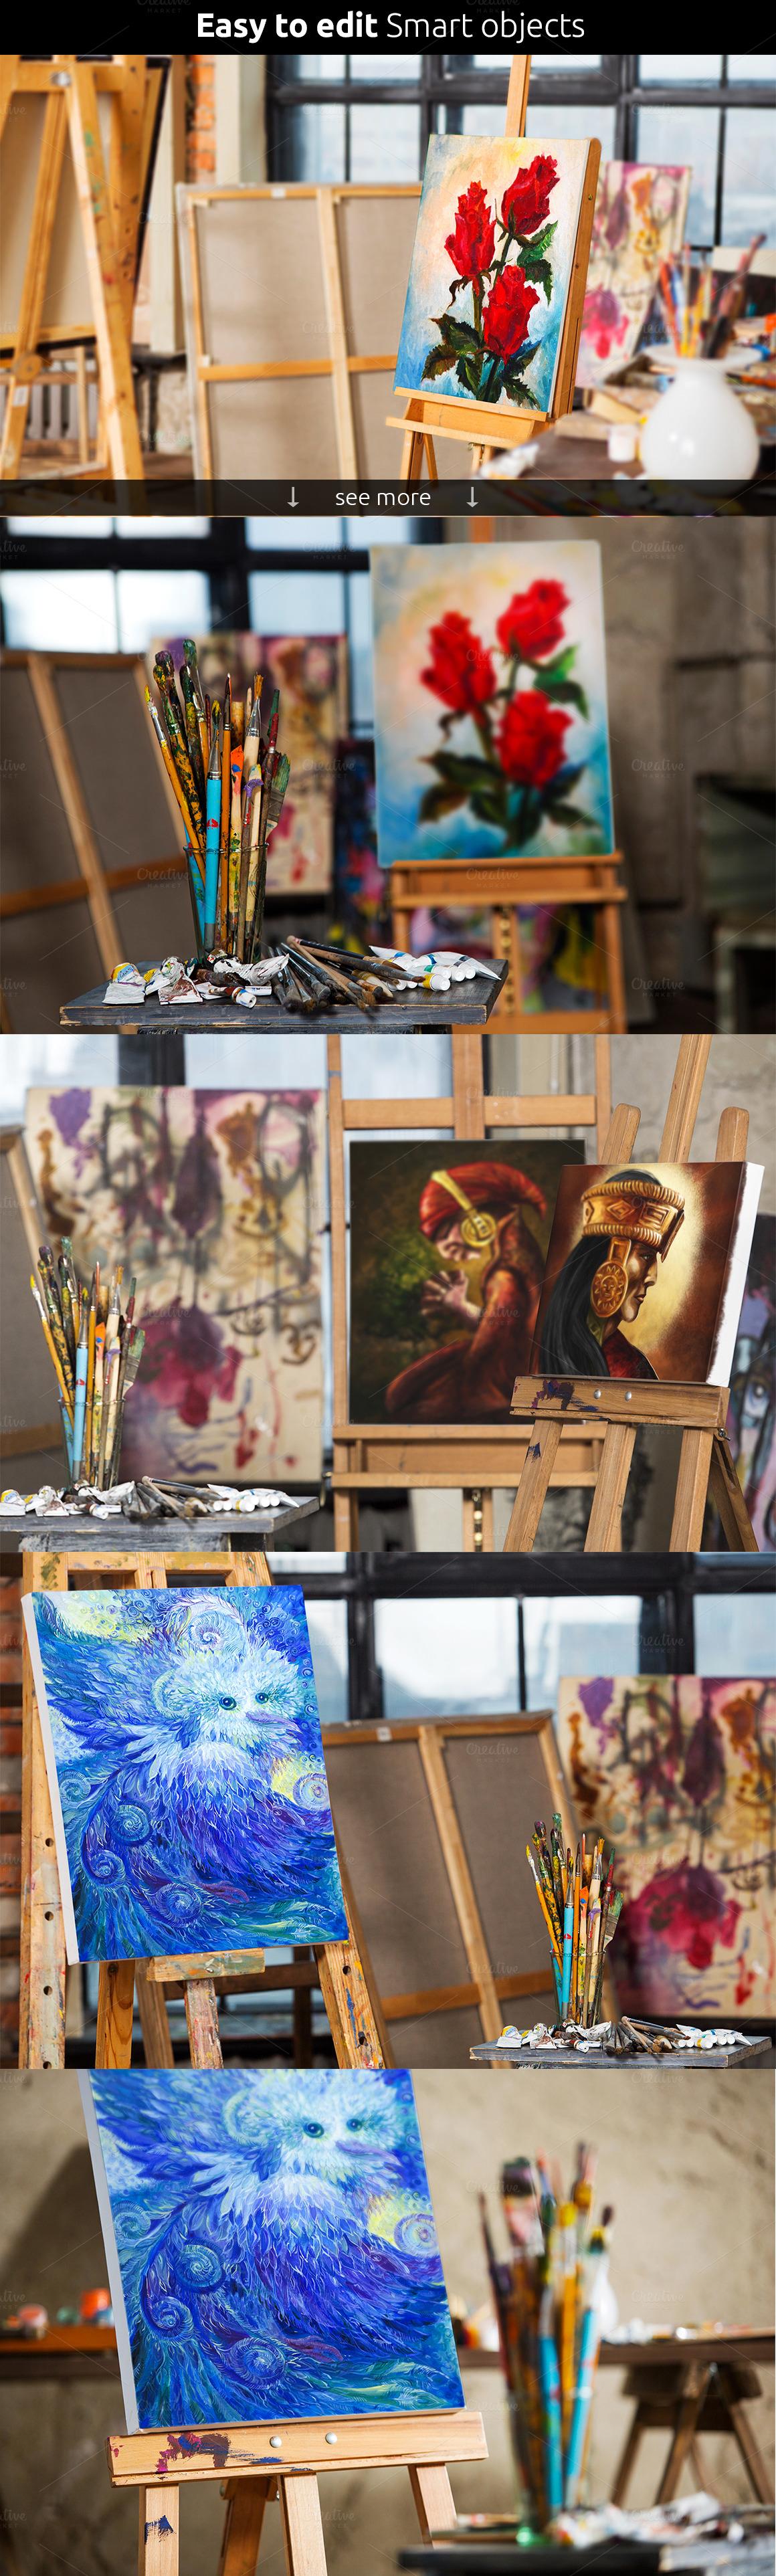 Art Canvas Realistic Studio Mock-Up - Product Mockups - 3